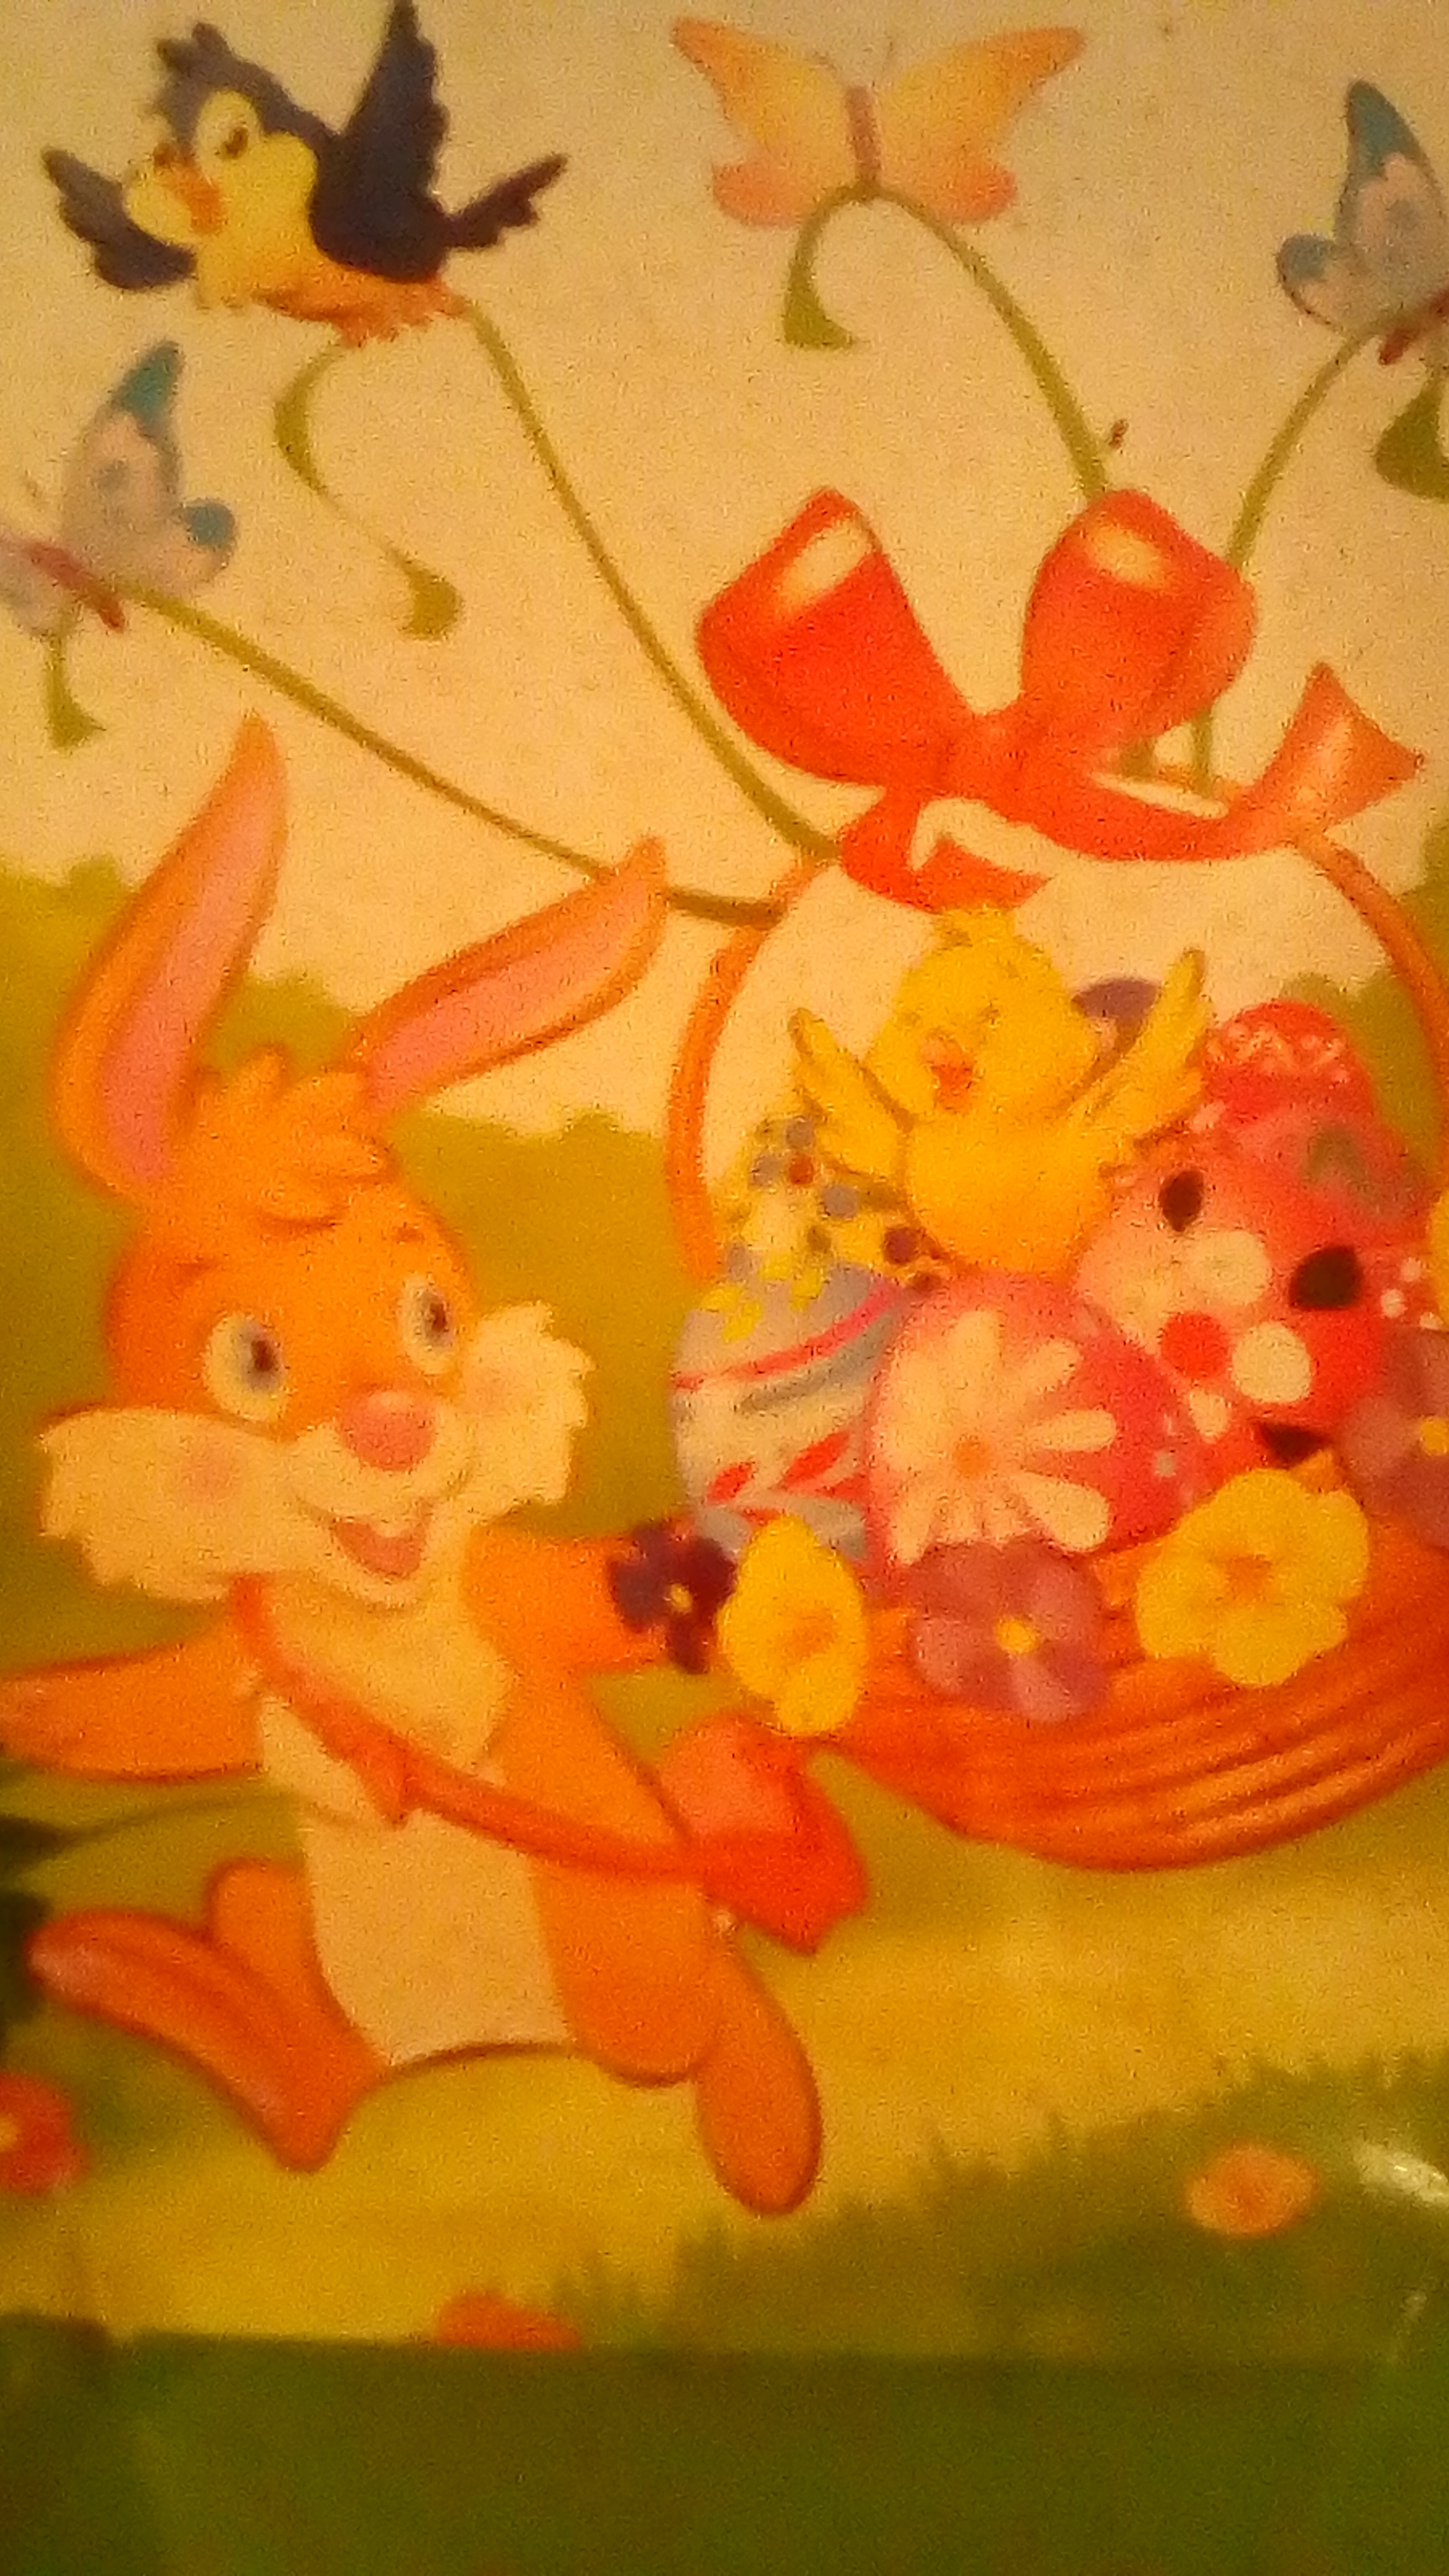 Easter Bunny with Easter Egg Basket